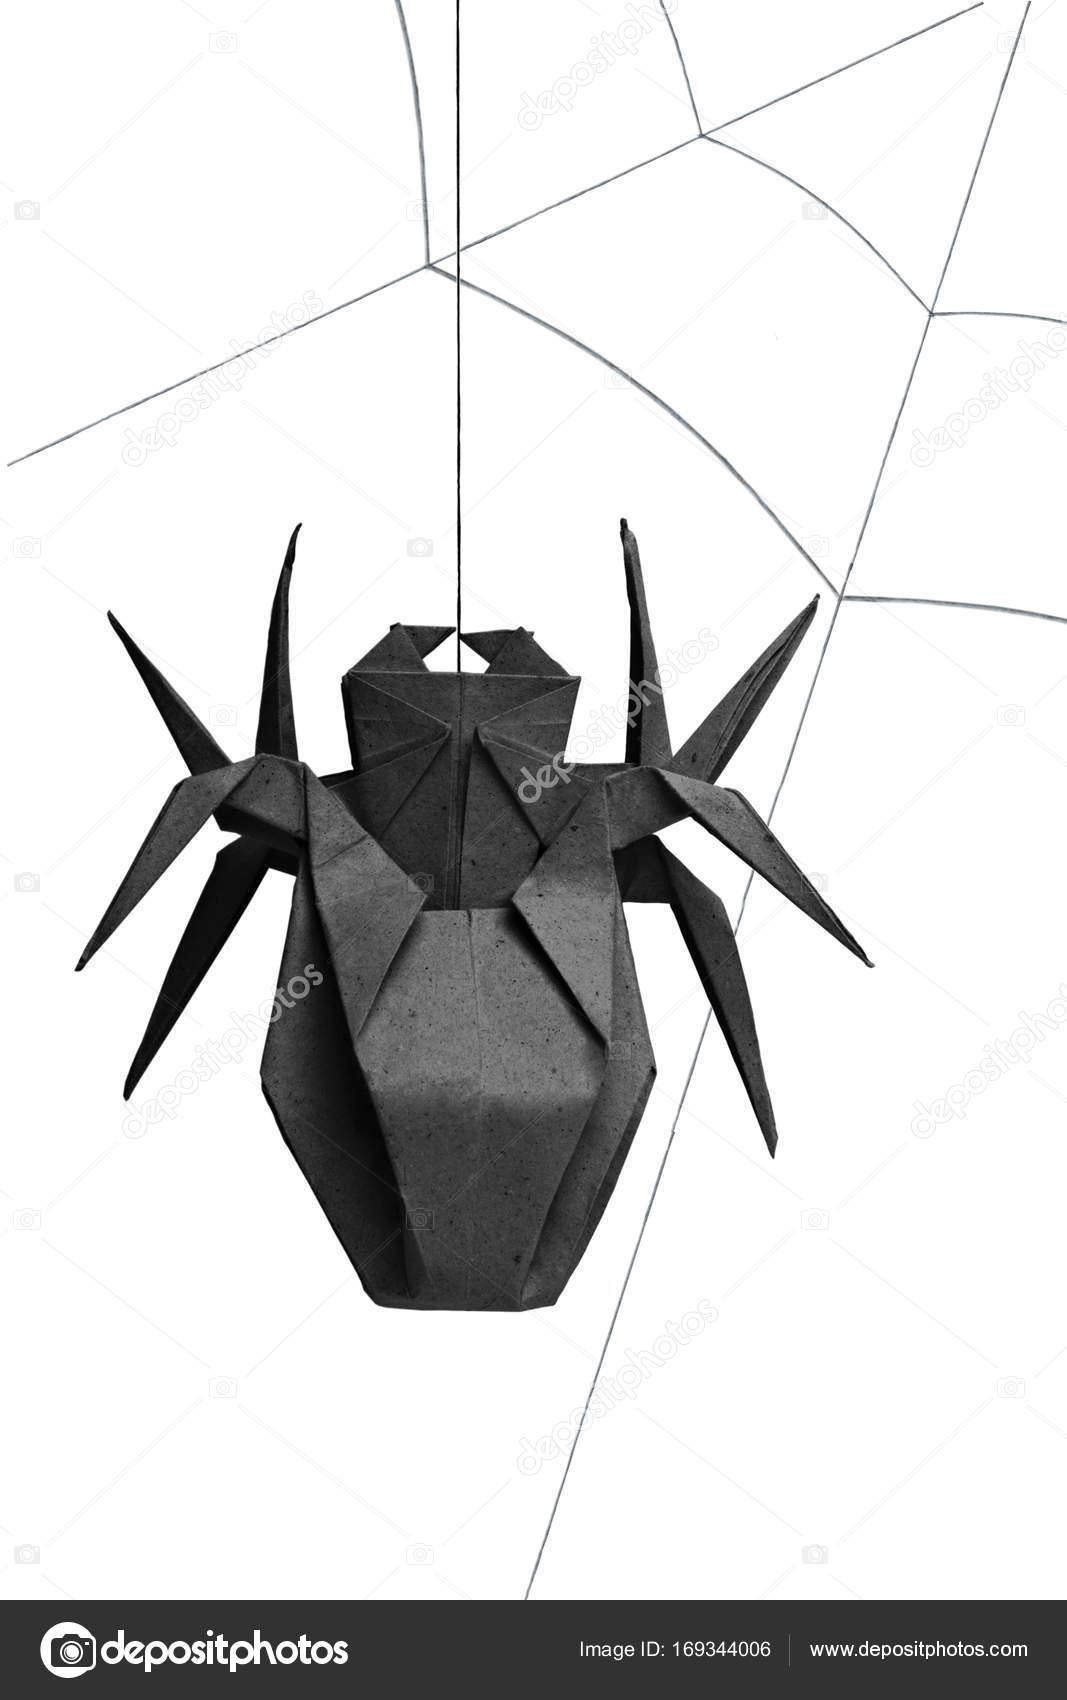 araignée origami isolée — photographie mandrixta © #169344006